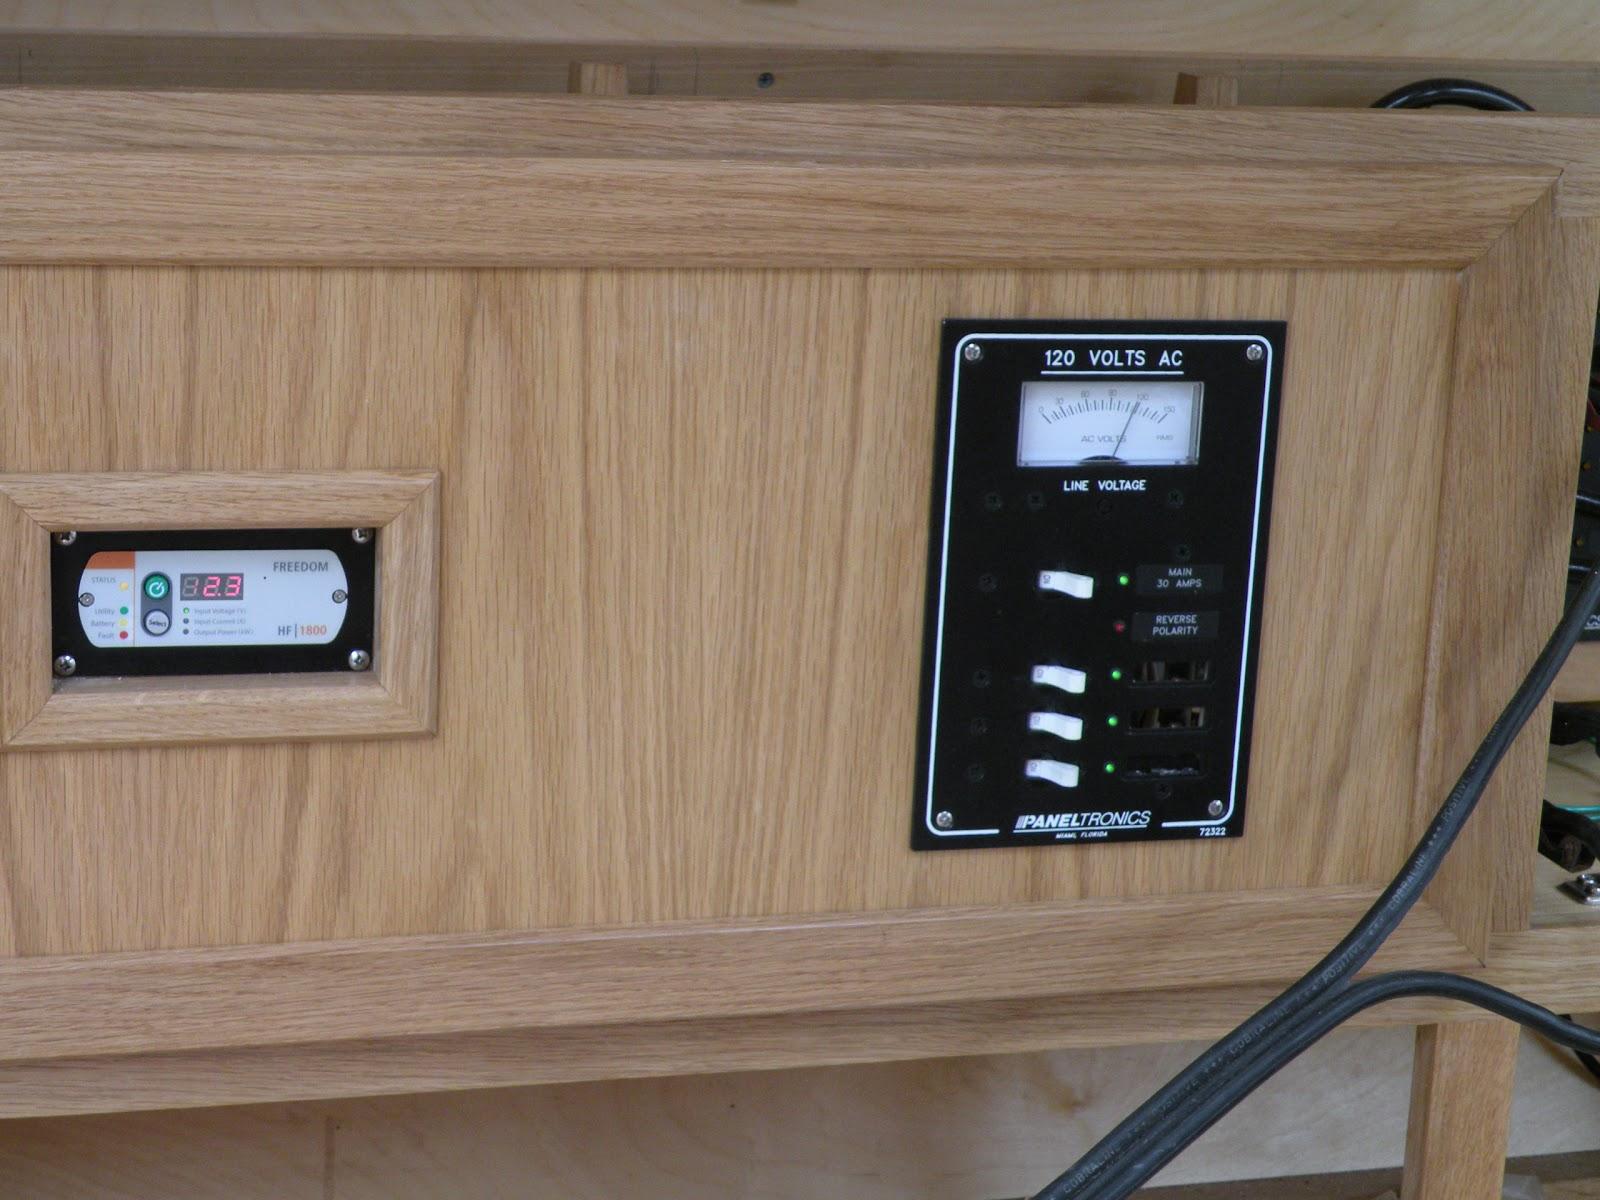 Emmitt U0026 39 S Teardrop Adventures  An Energized System  Plywood